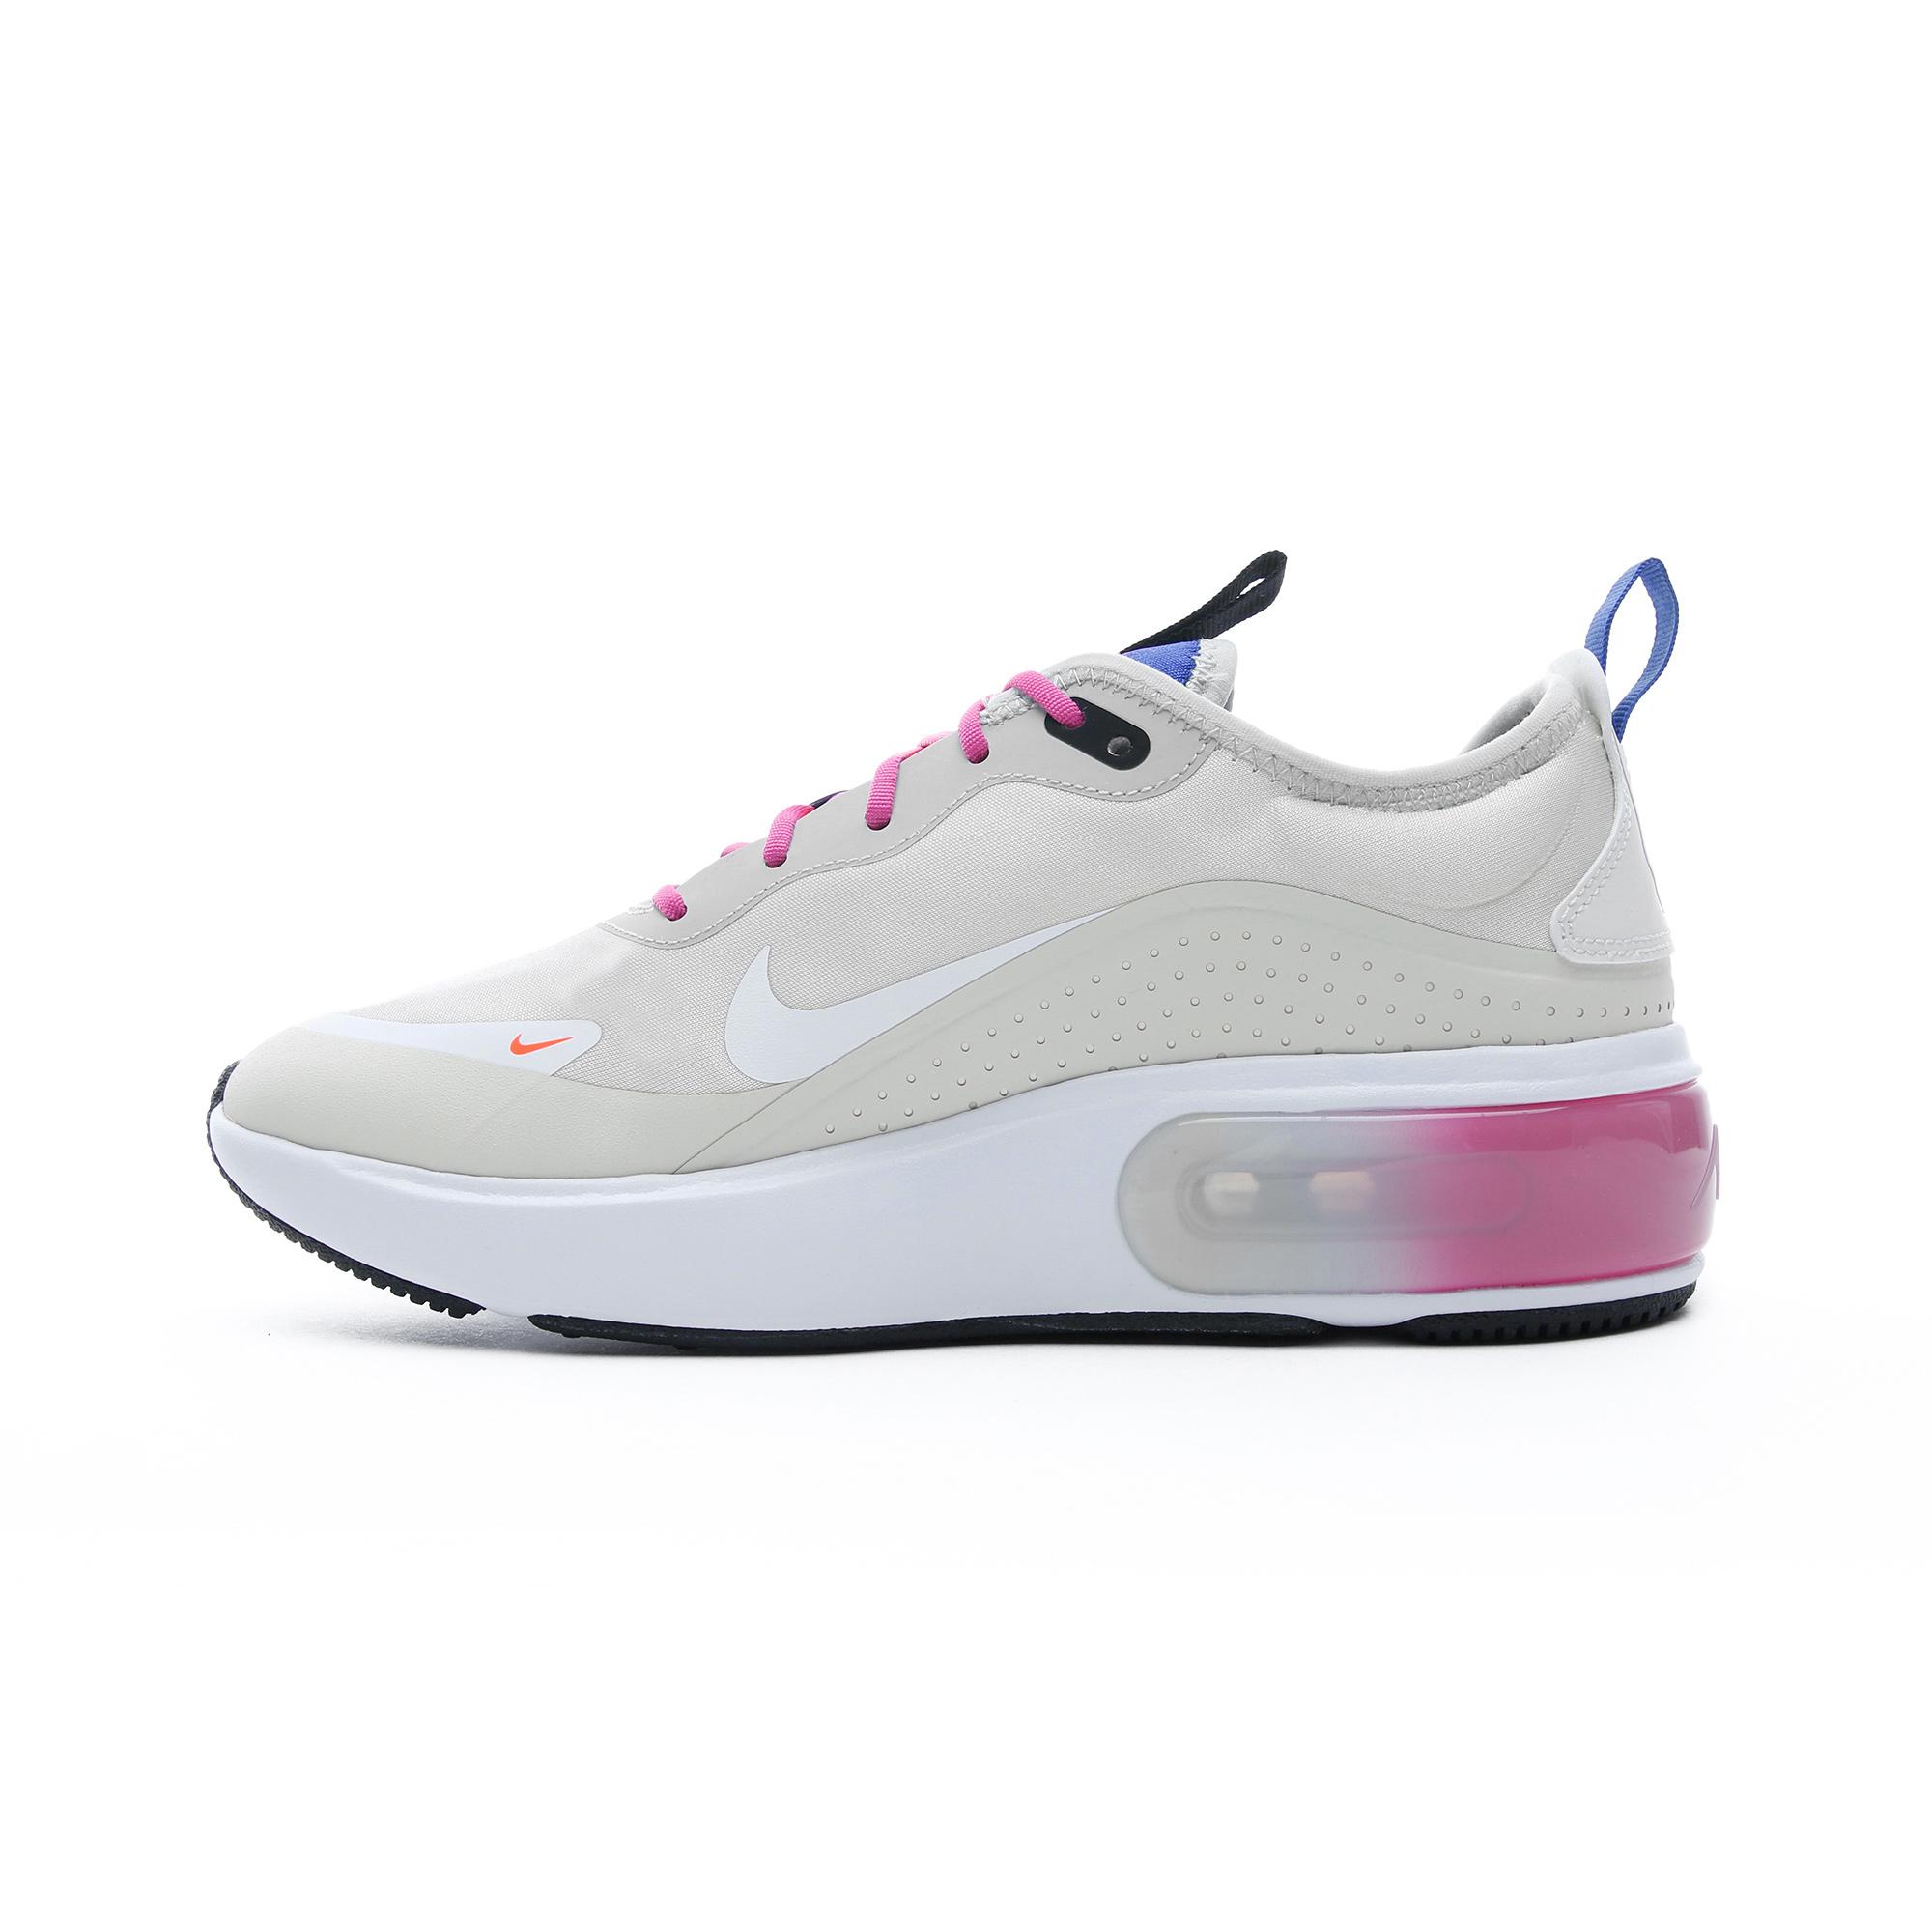 Nike Air Max Dia Kadın Krem Spor Ayakkabı